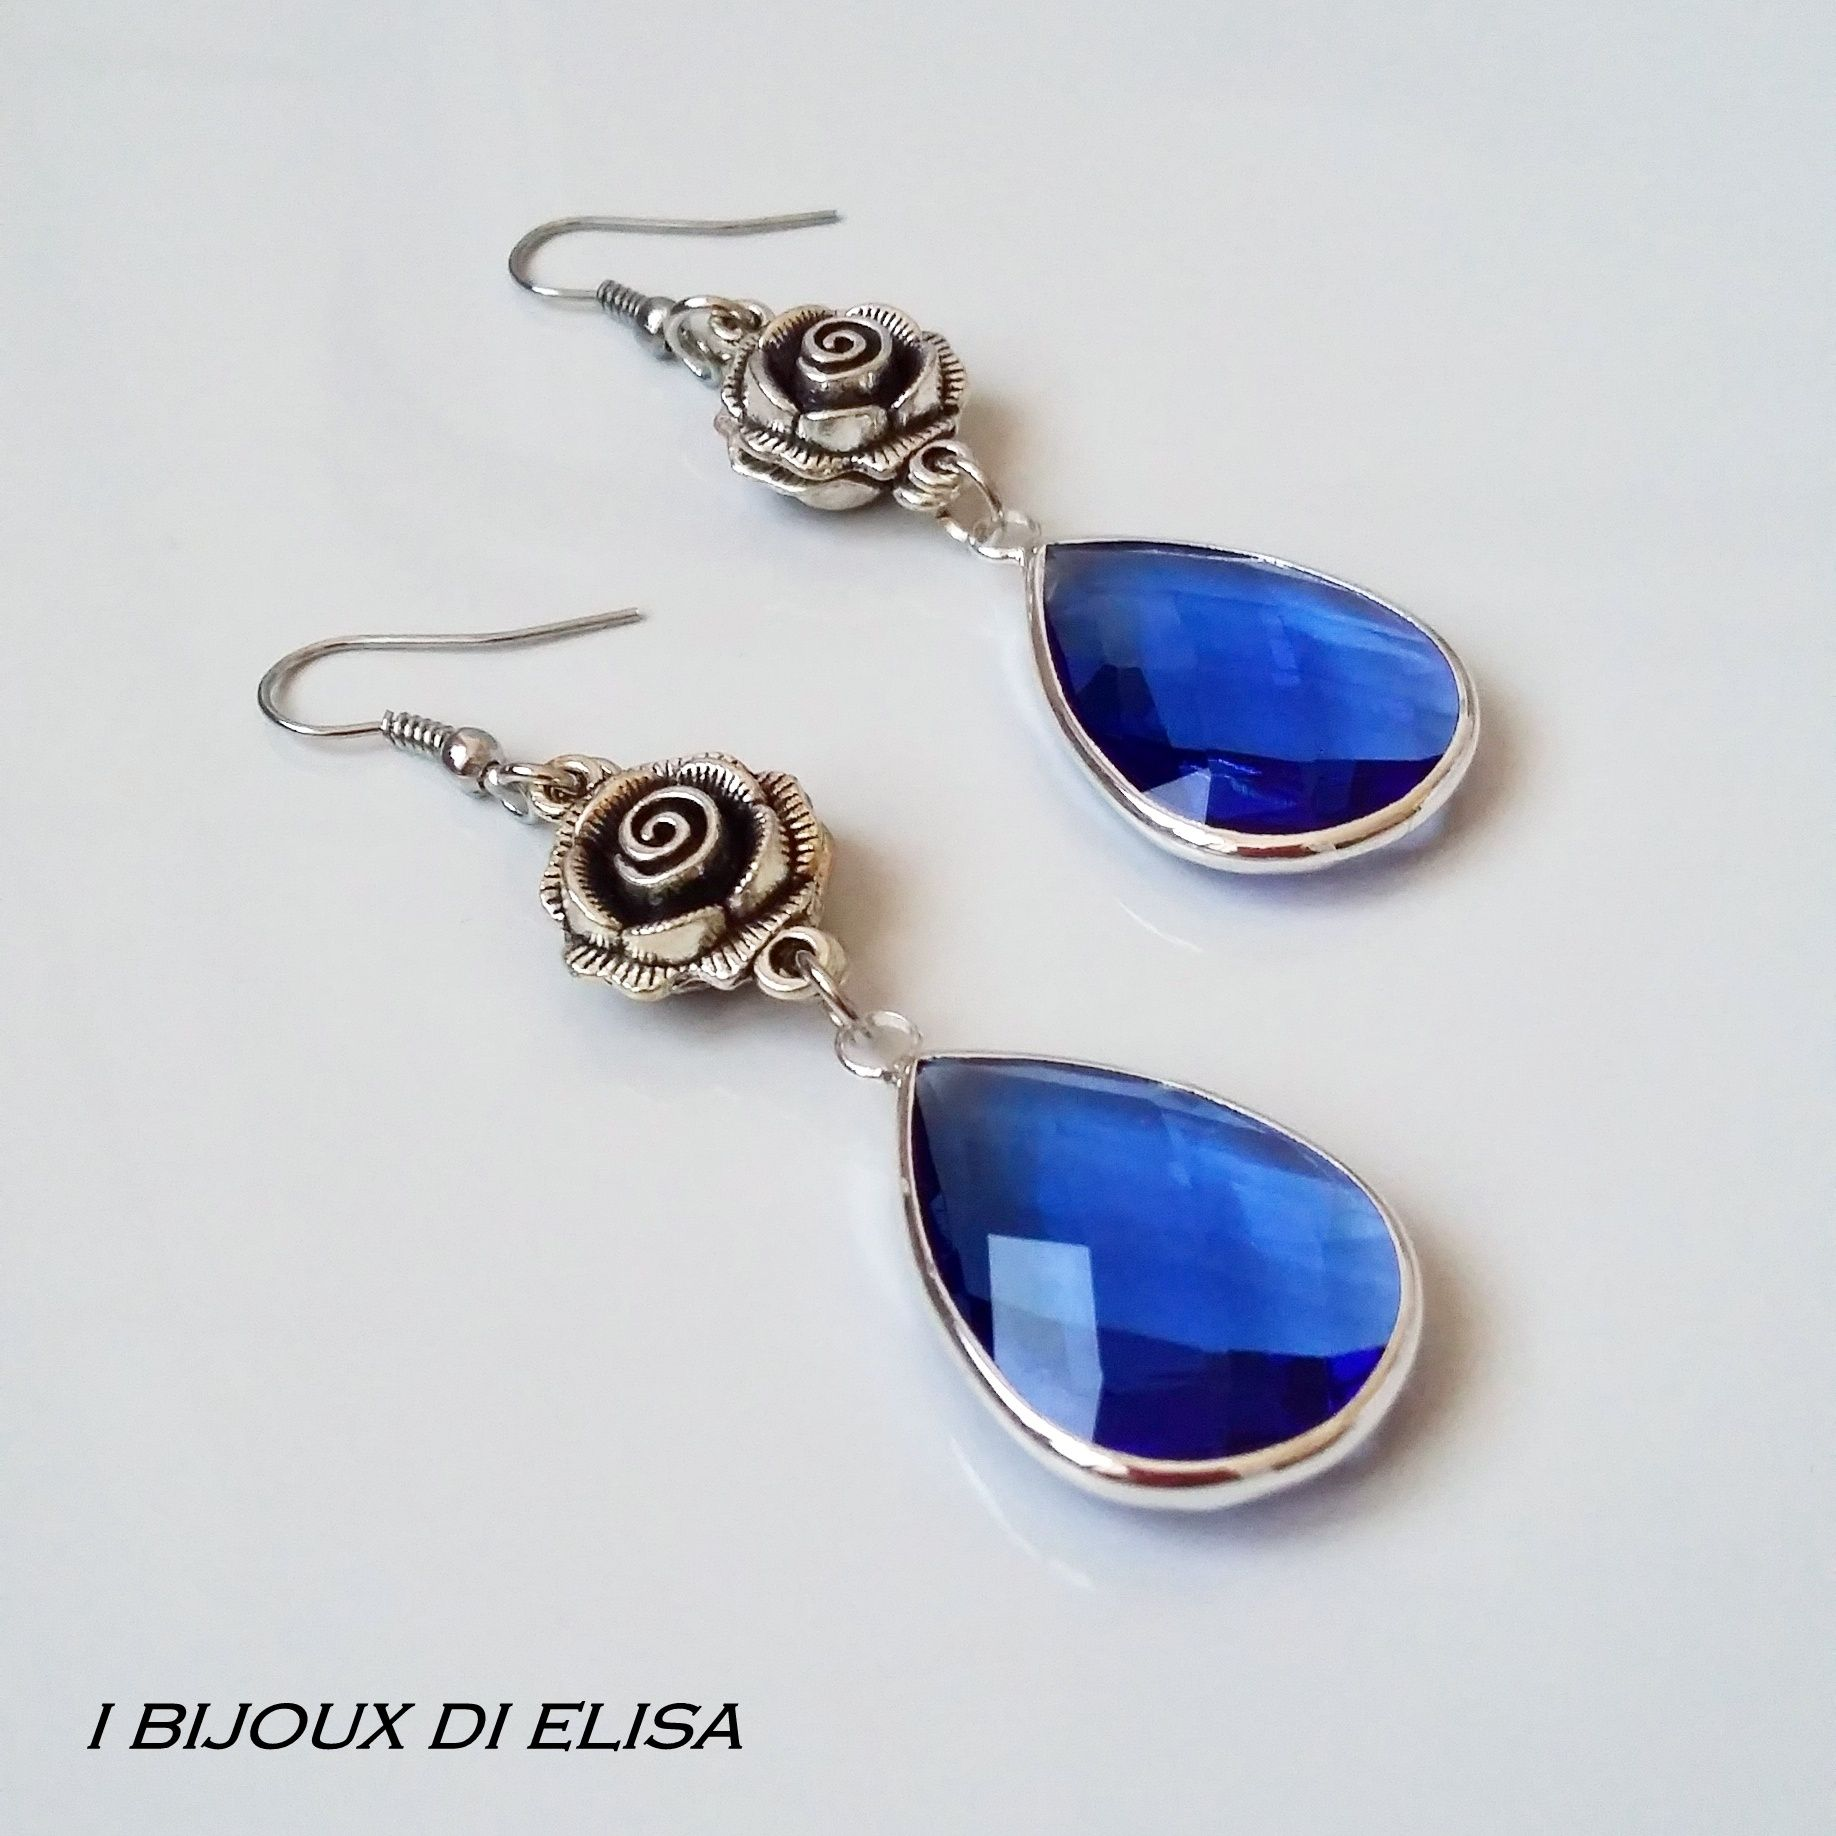 "Blue crystals in my new collection ""Preziosa"": discover it on my etsy shop!   #earrings #blue #blueearrings #elegantearrings #ibijouxdielisa #handmade #artigianato #jewels #jewel #bijoux #costumejewelry #drop #rose #roses #orecchini #etsy #etsyseller #etsyshop #etsystore"